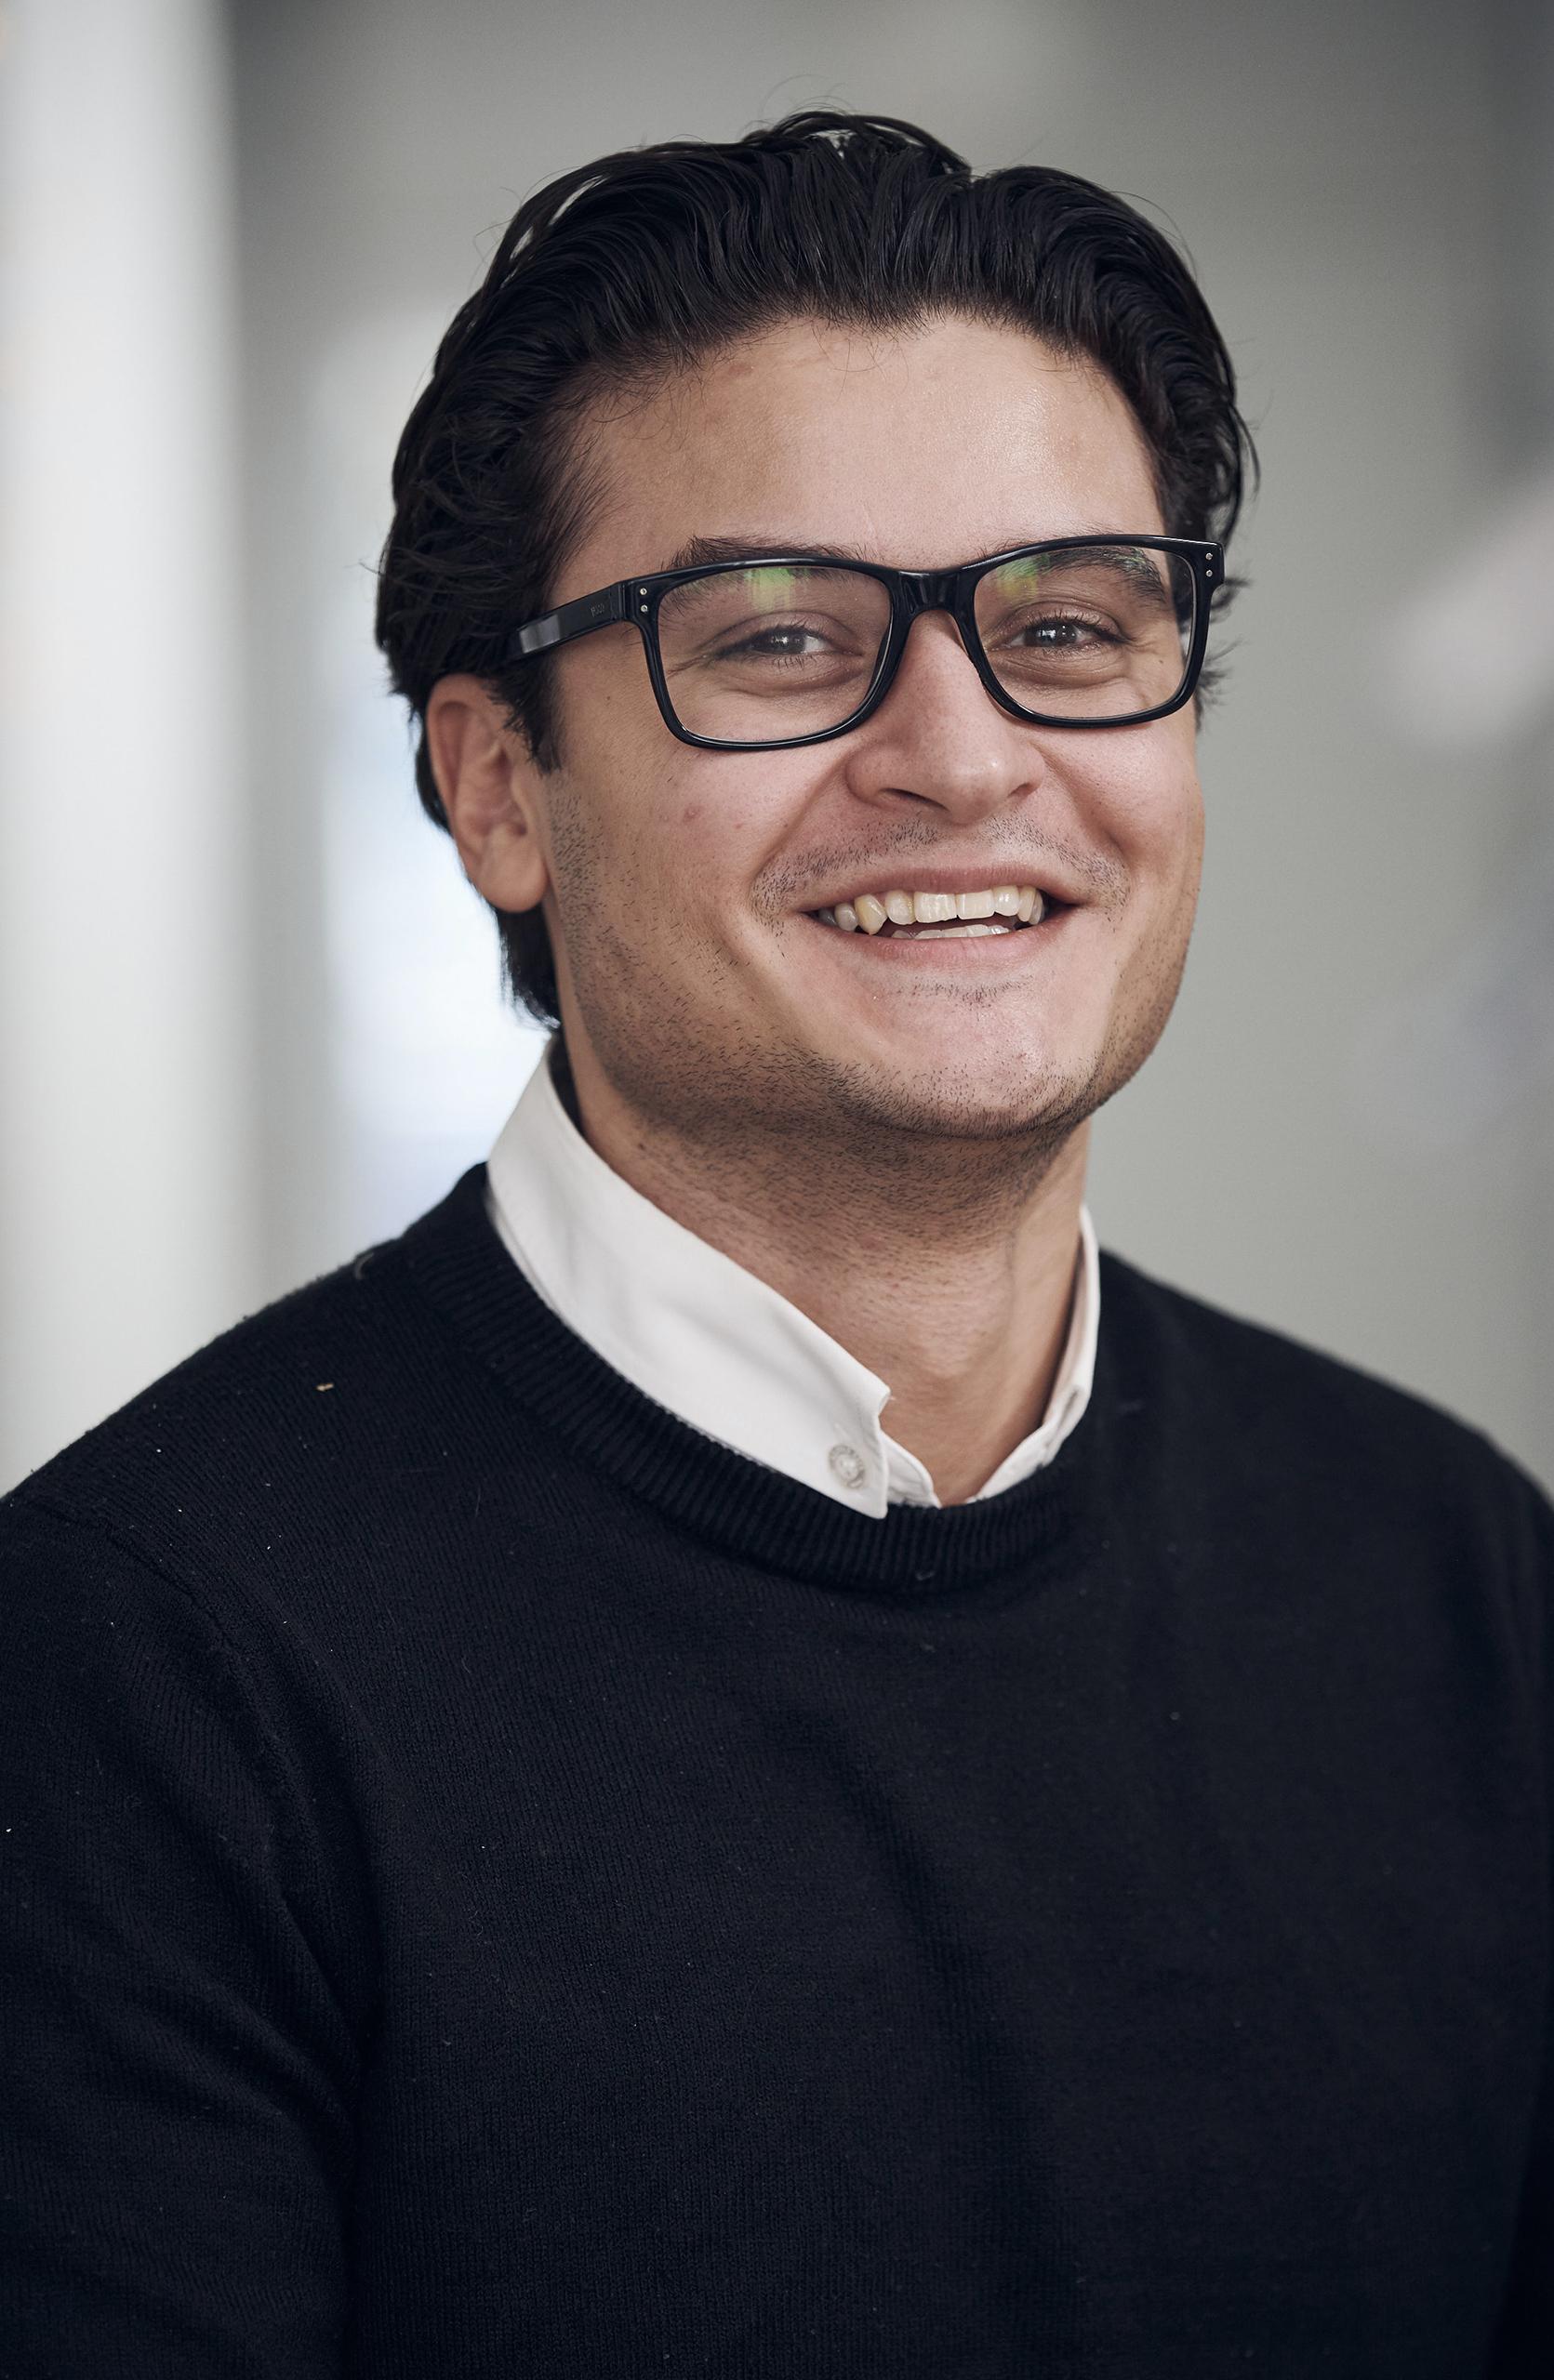 Ismail Berk